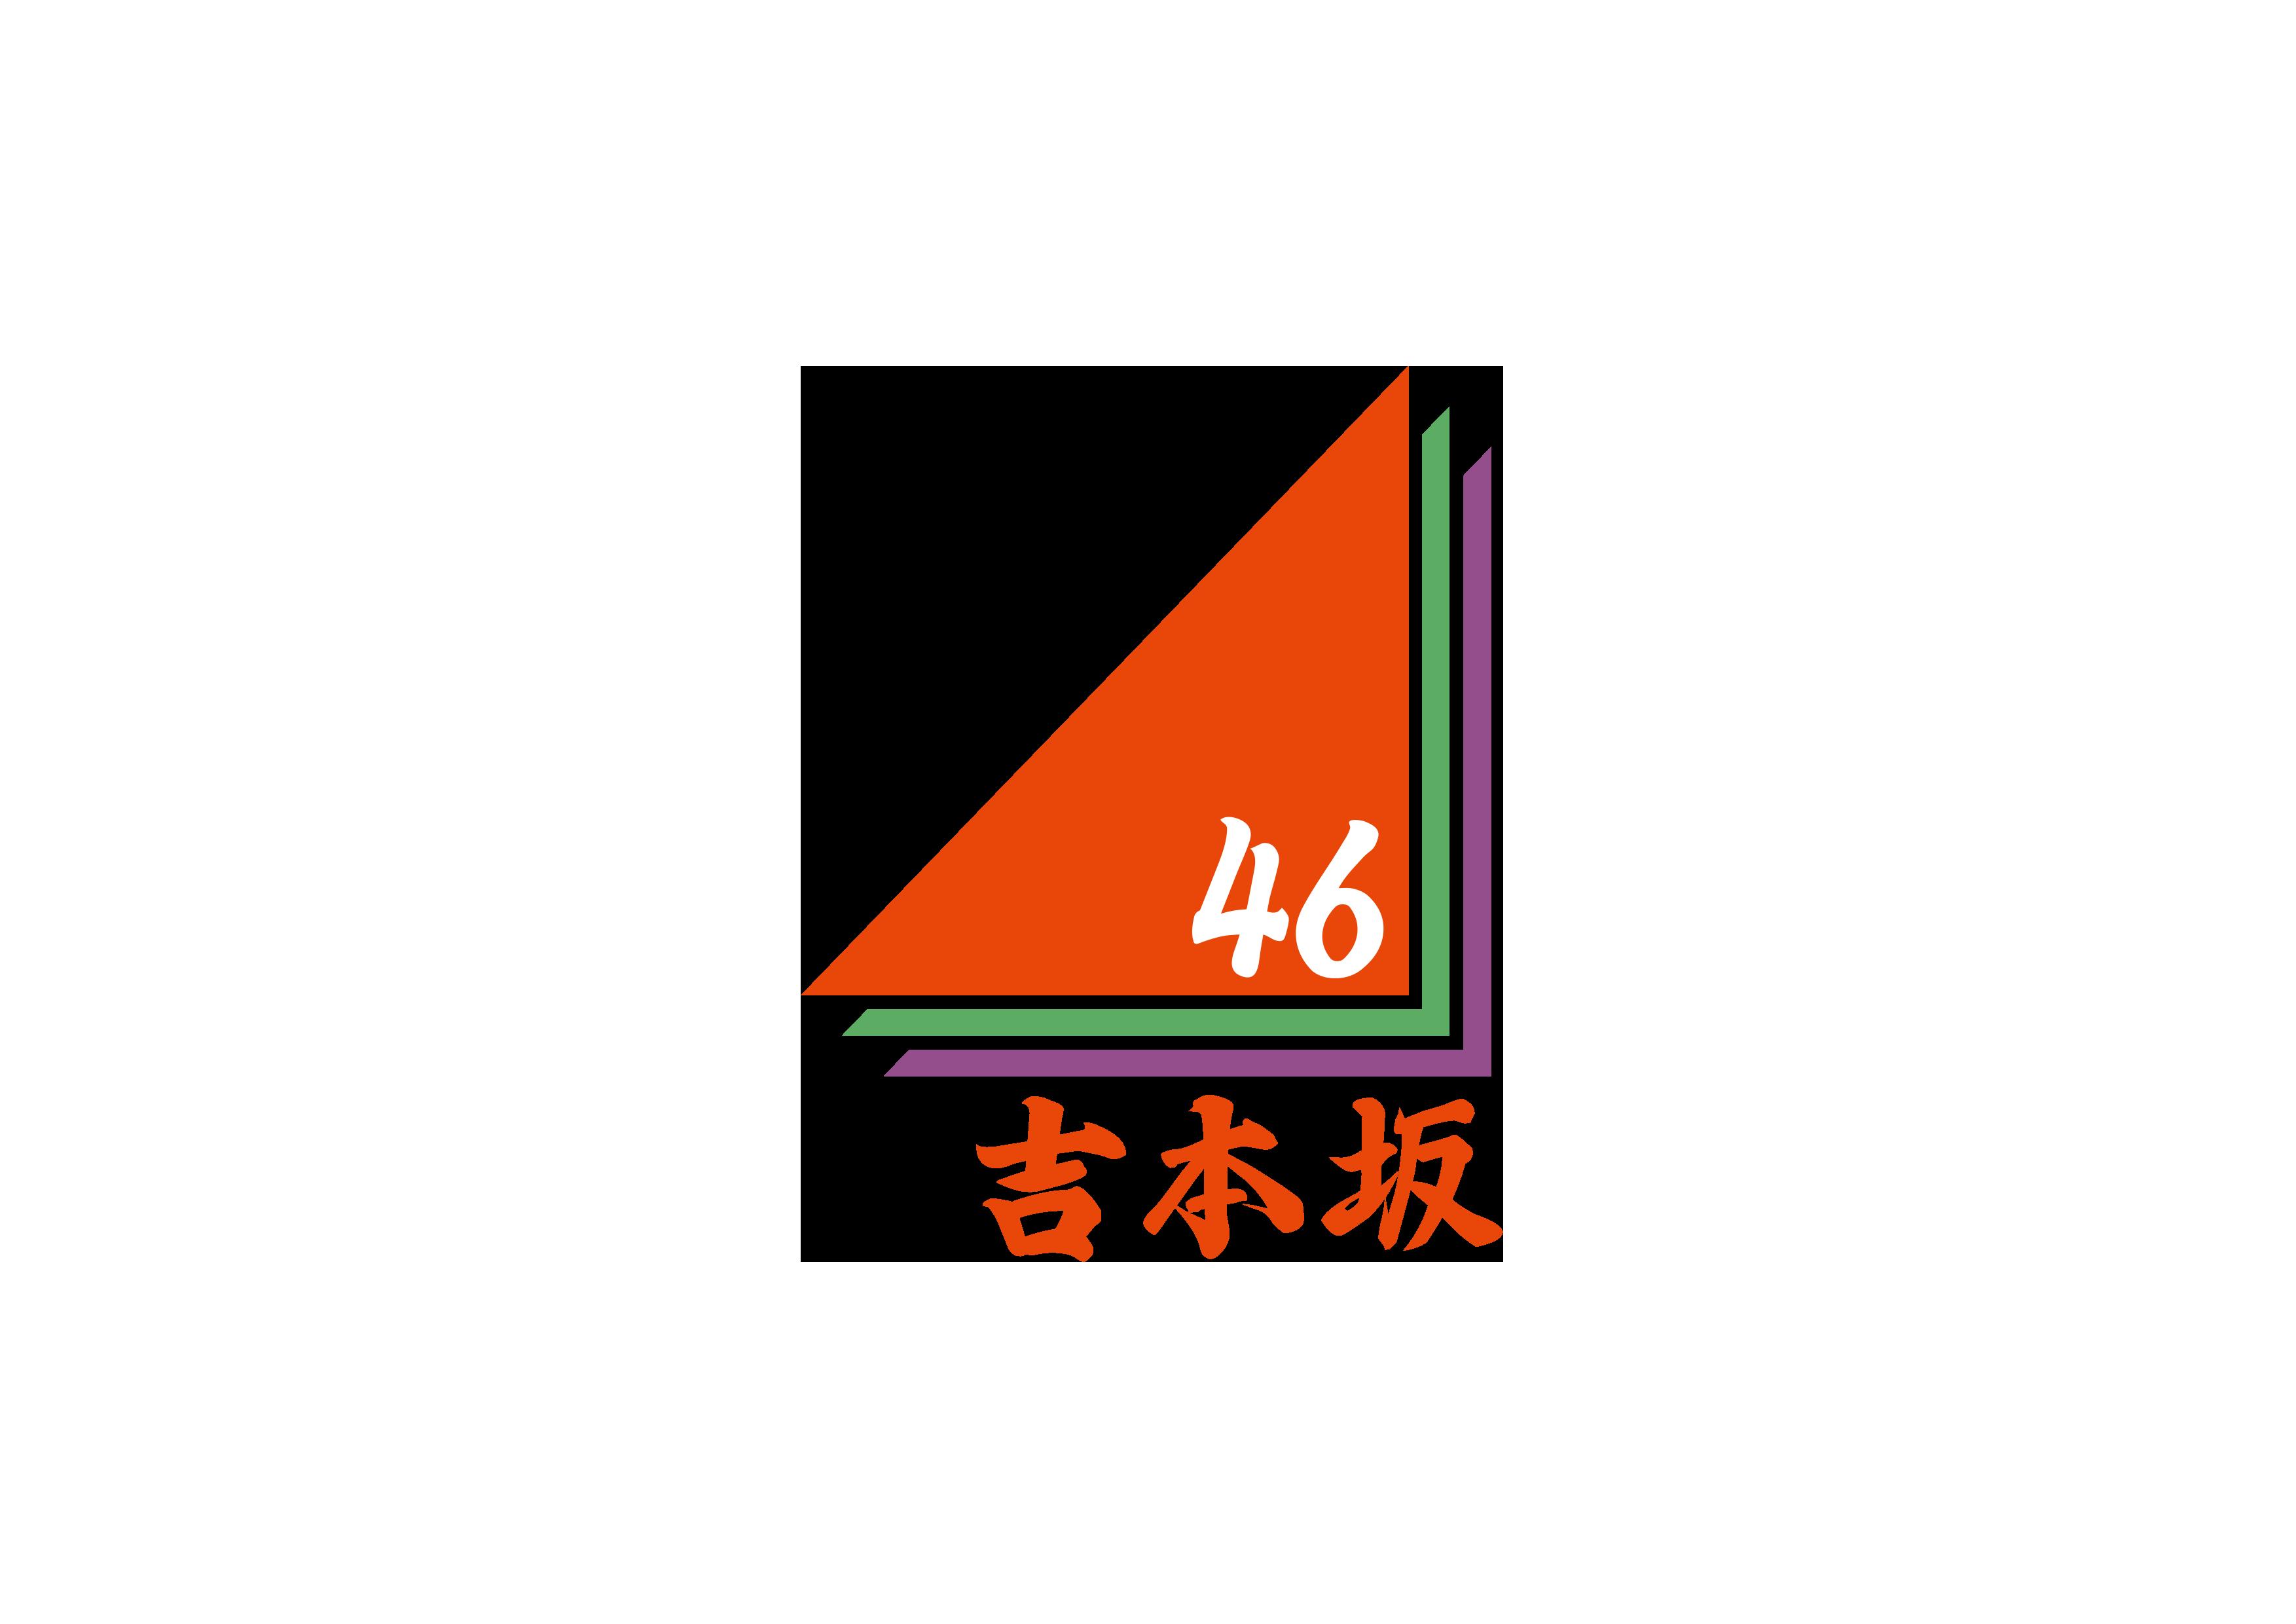 http://news.yoshimoto.co.jp/20180517170934-48e6c53fe95695b25a5c3549832530e0252f688c.png